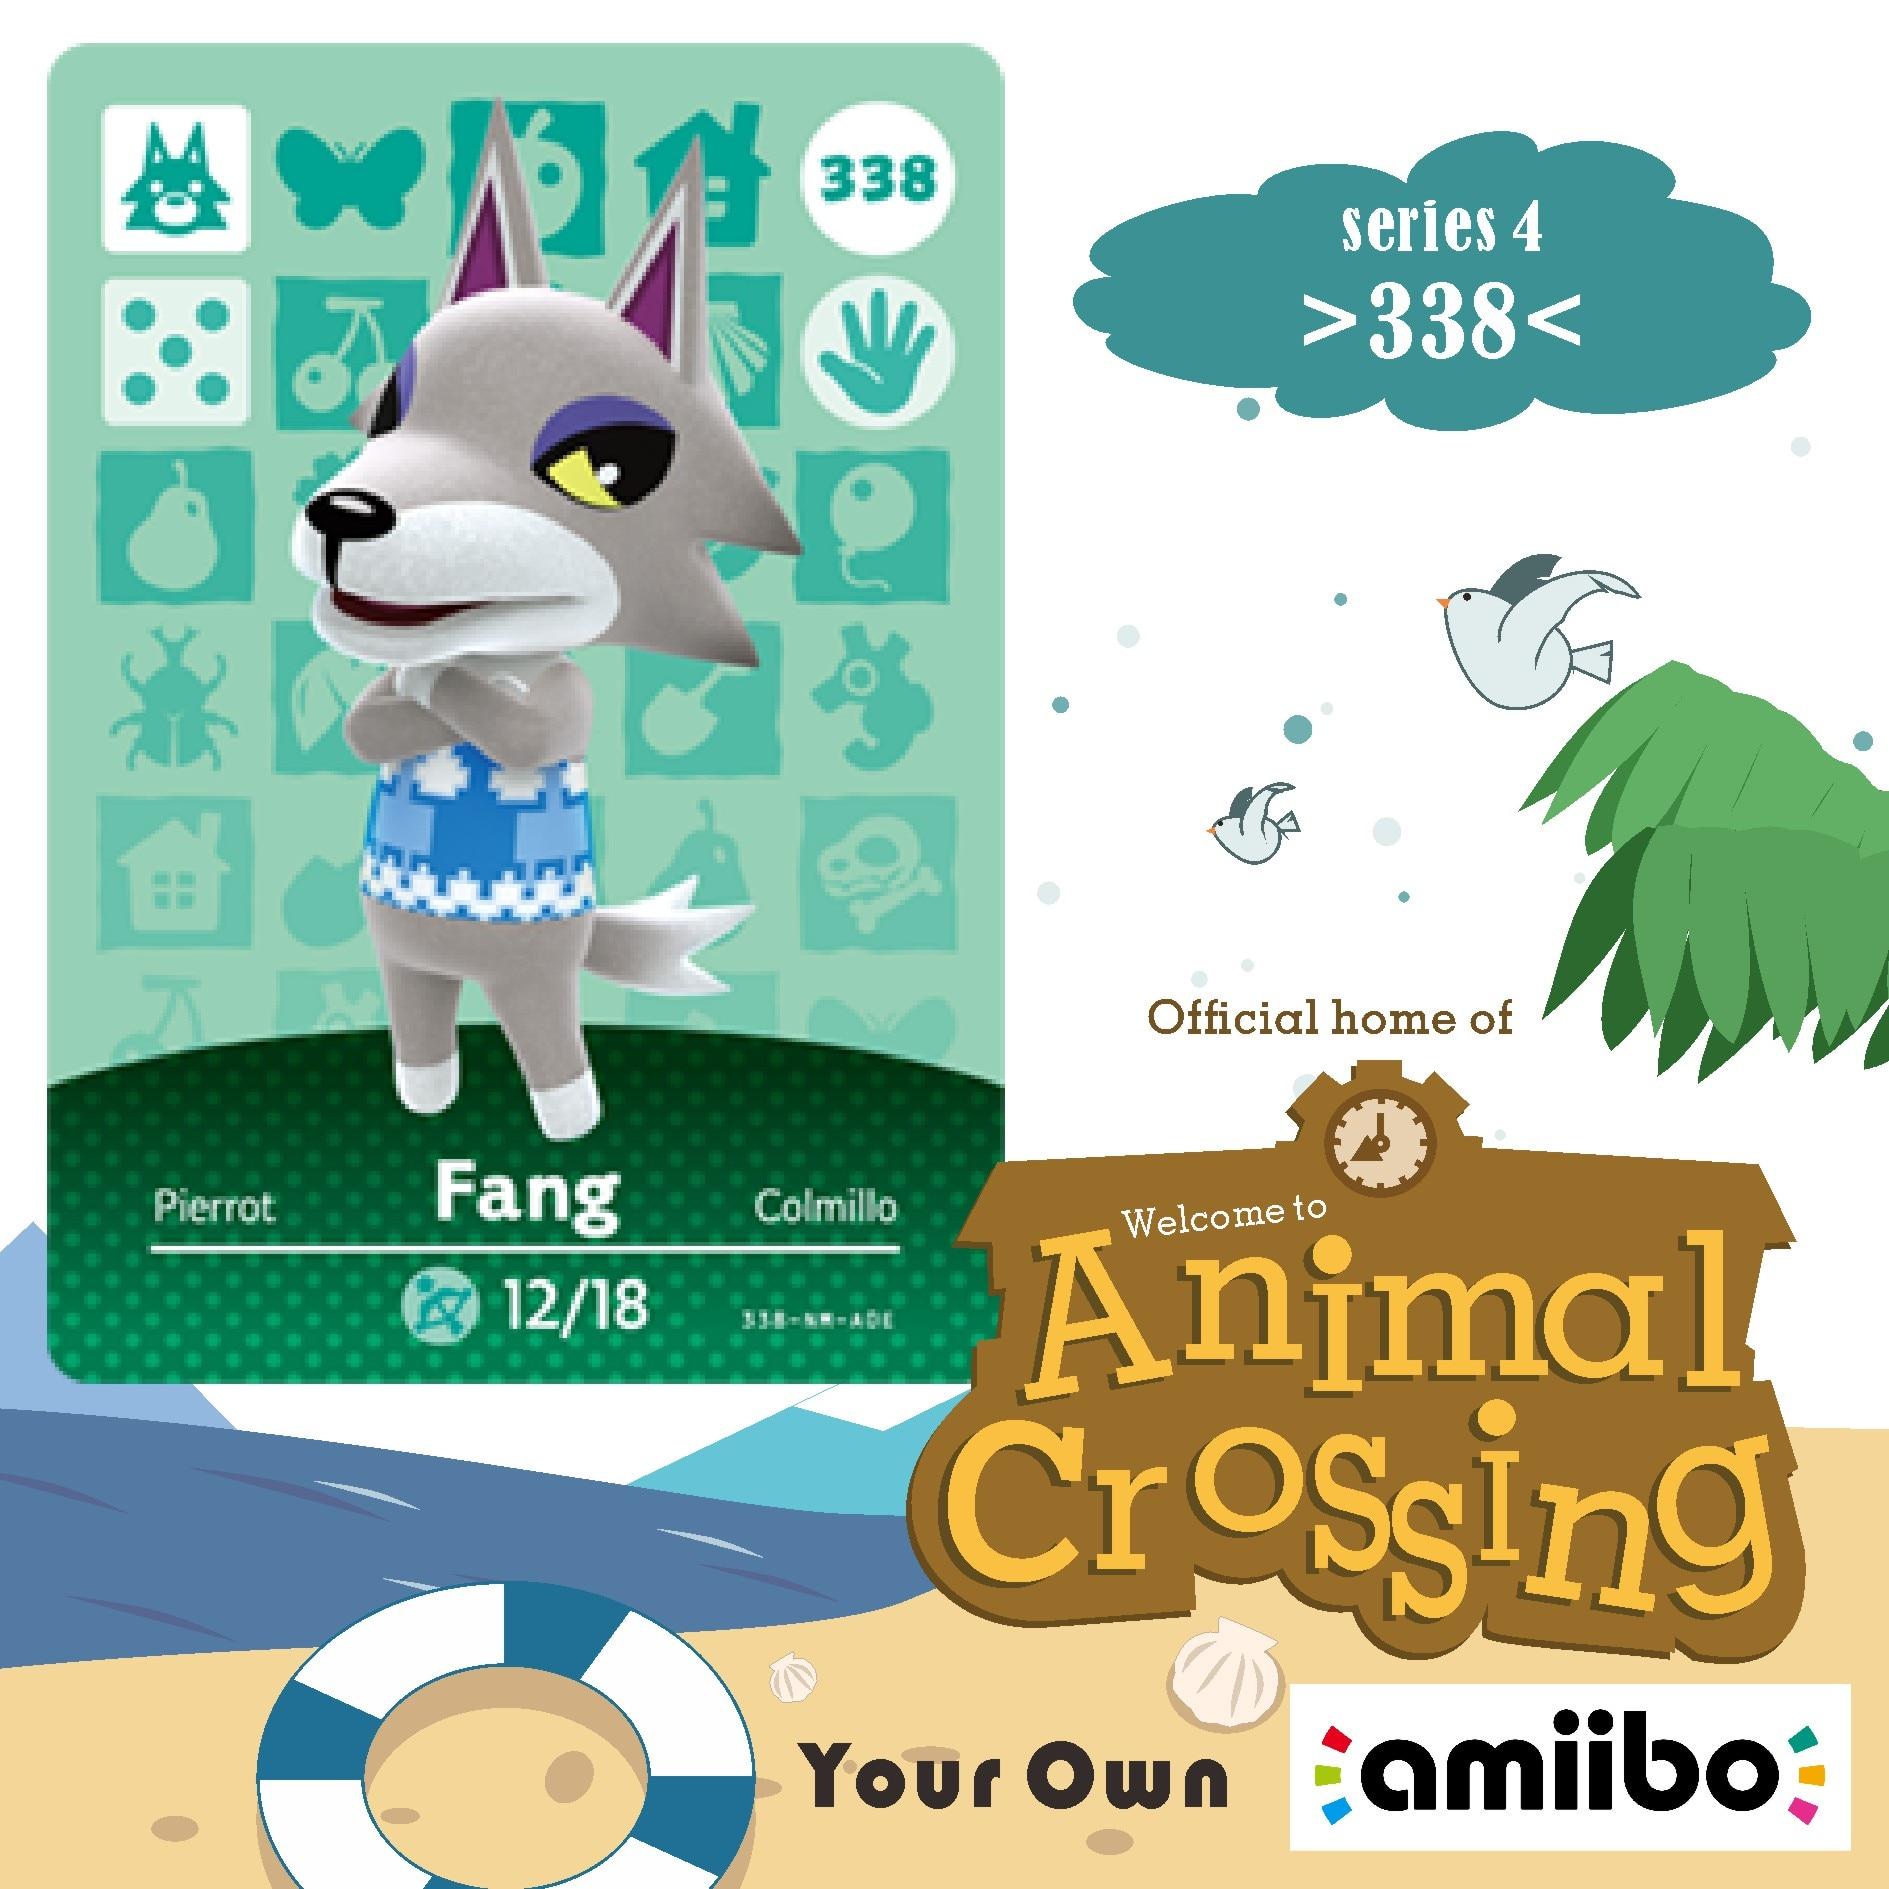 338 Animal Crossing Fang Amiibo Card Fang Crossing Switch Rv Welcome Amiibo Villager New Horizons Amiibo Card Gift Cross Cards